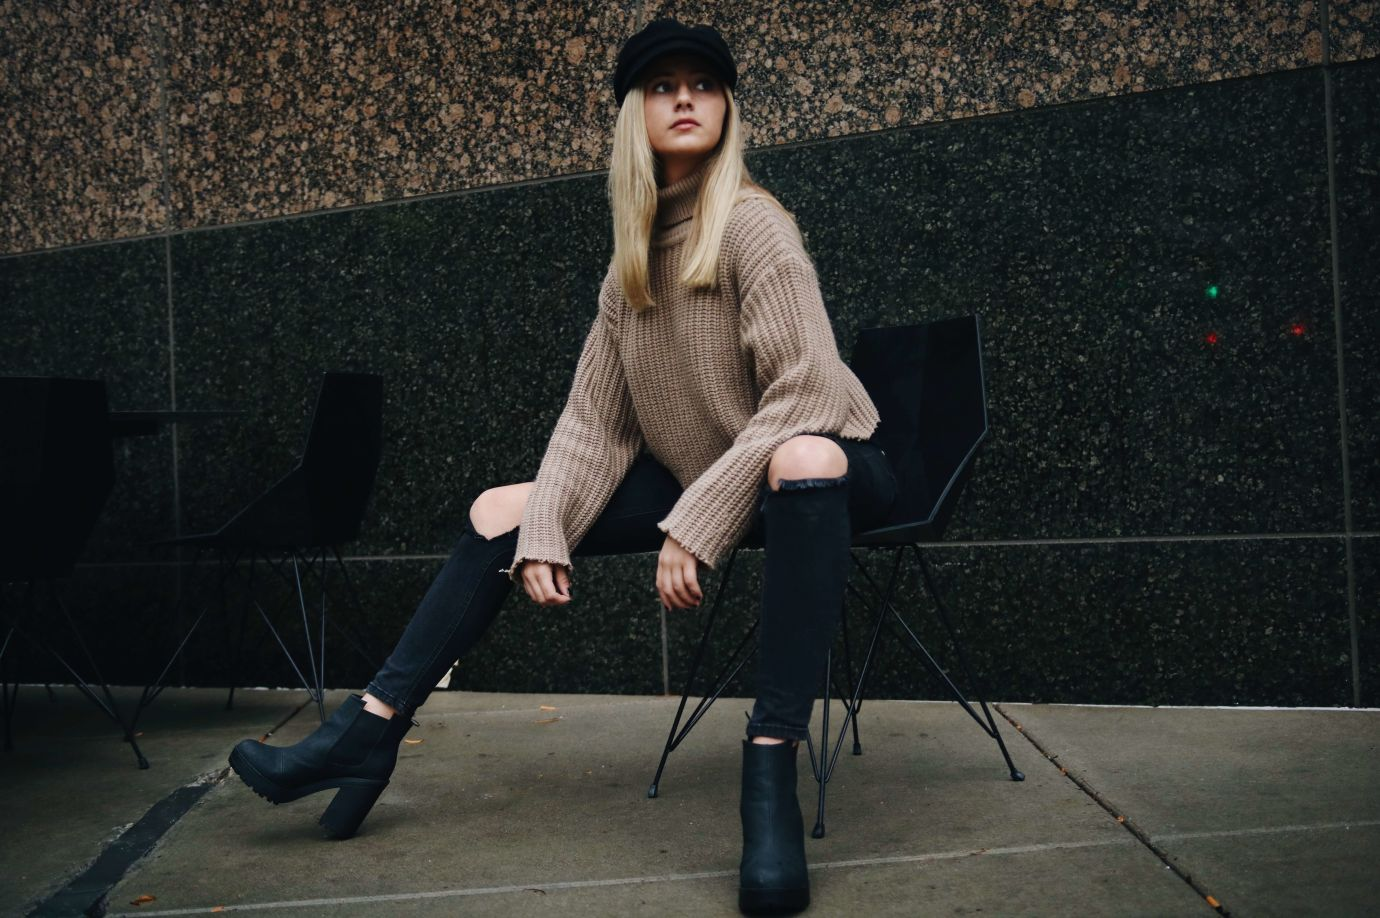 Frau mit Ankle Boots auf Stuhl